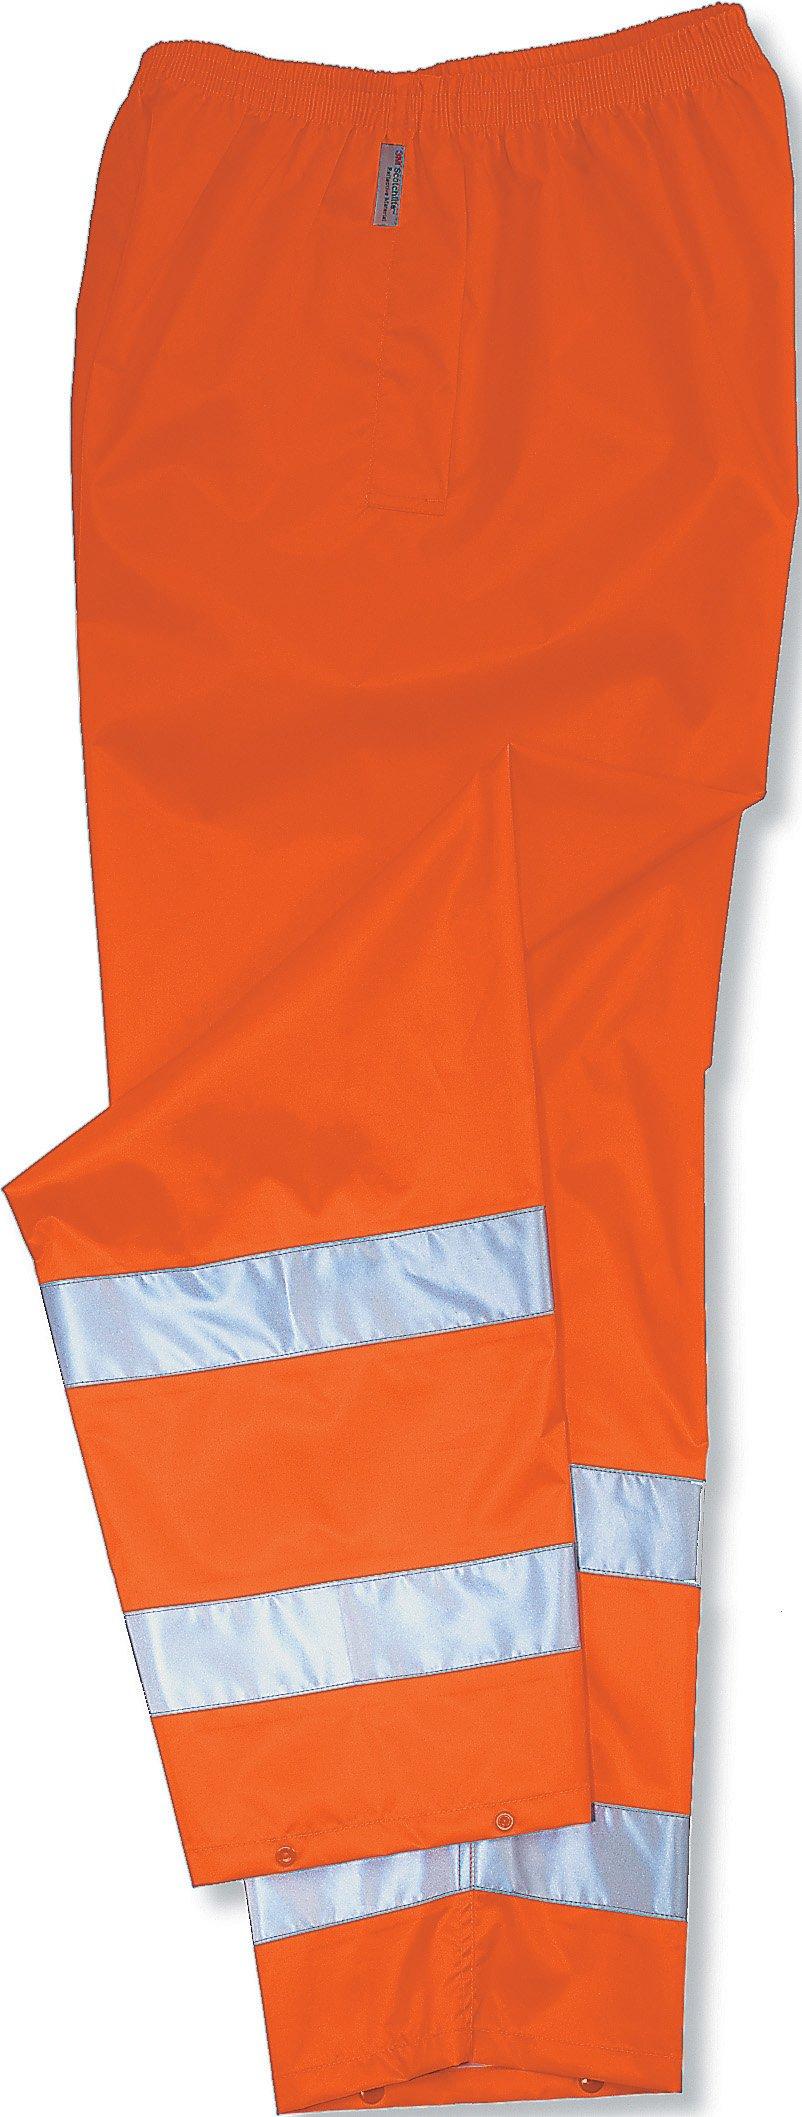 Ergodyne GloWear 8925 ANSI High Visibility Orange Reflective Thermal Safety Pants, 4XL